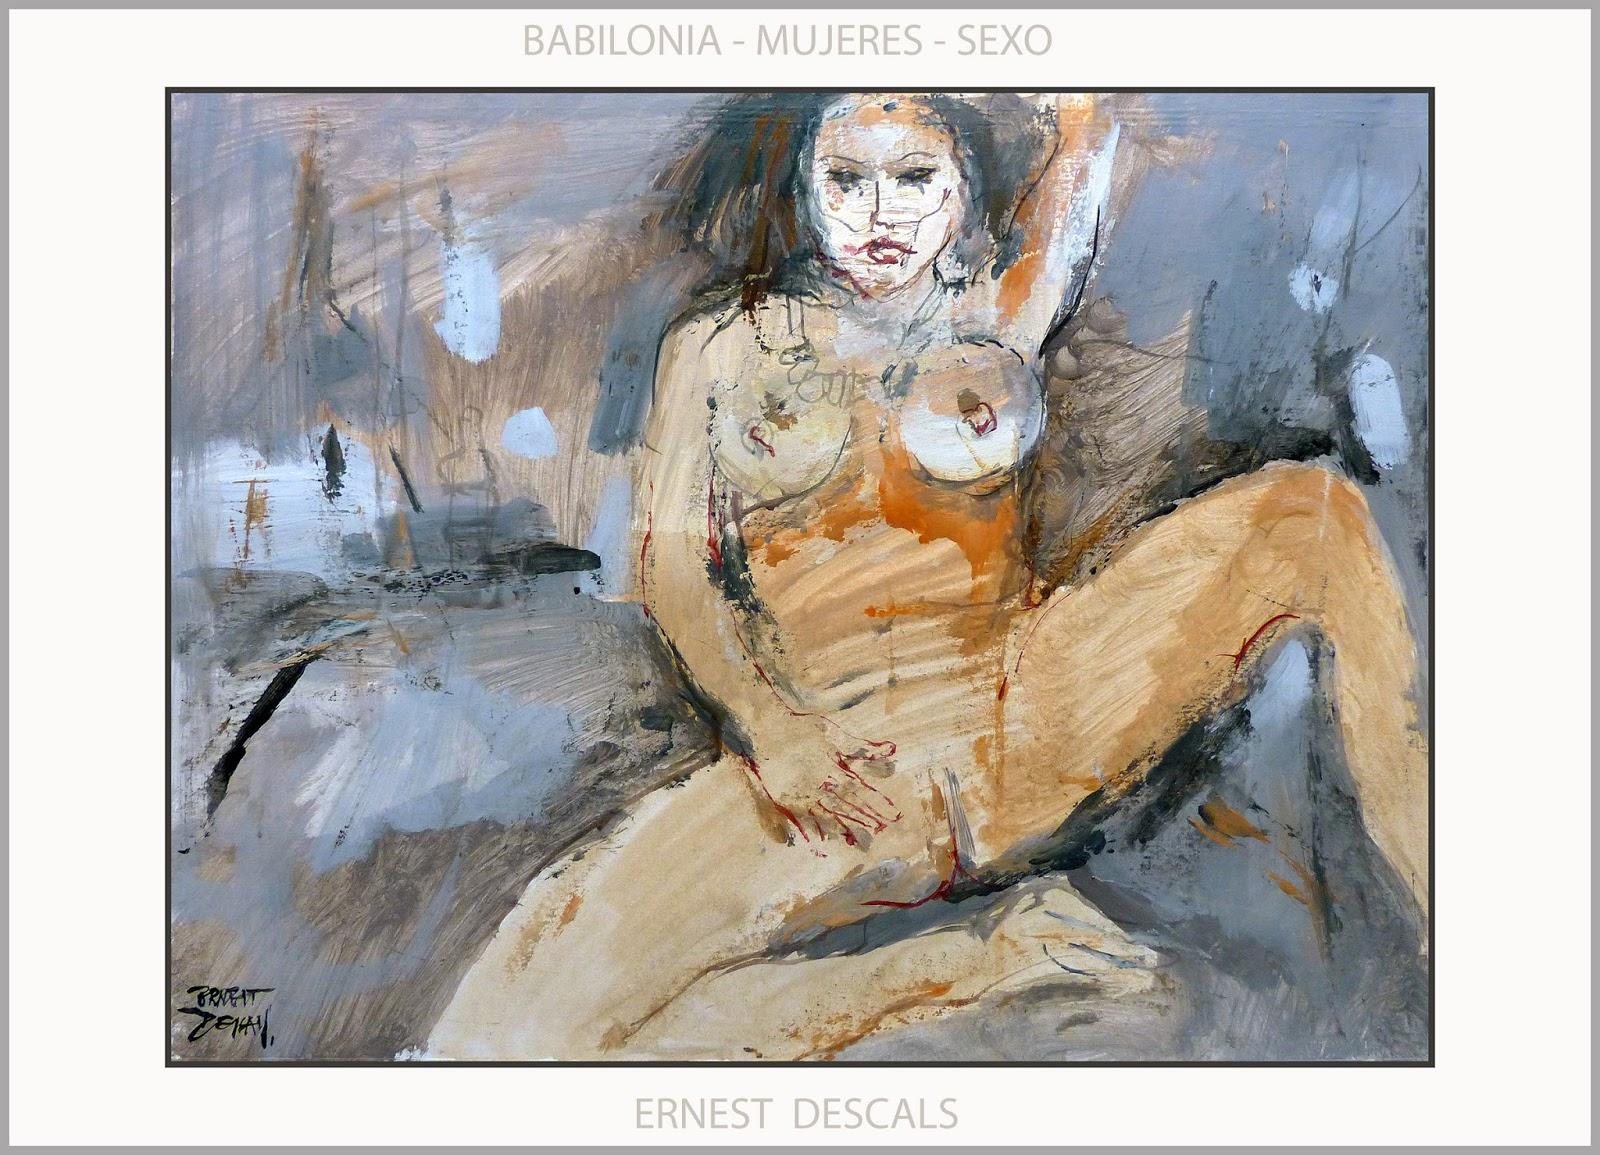 Arte de ligar mujeres sexo ahora Santa Cruz Tenerife-44762